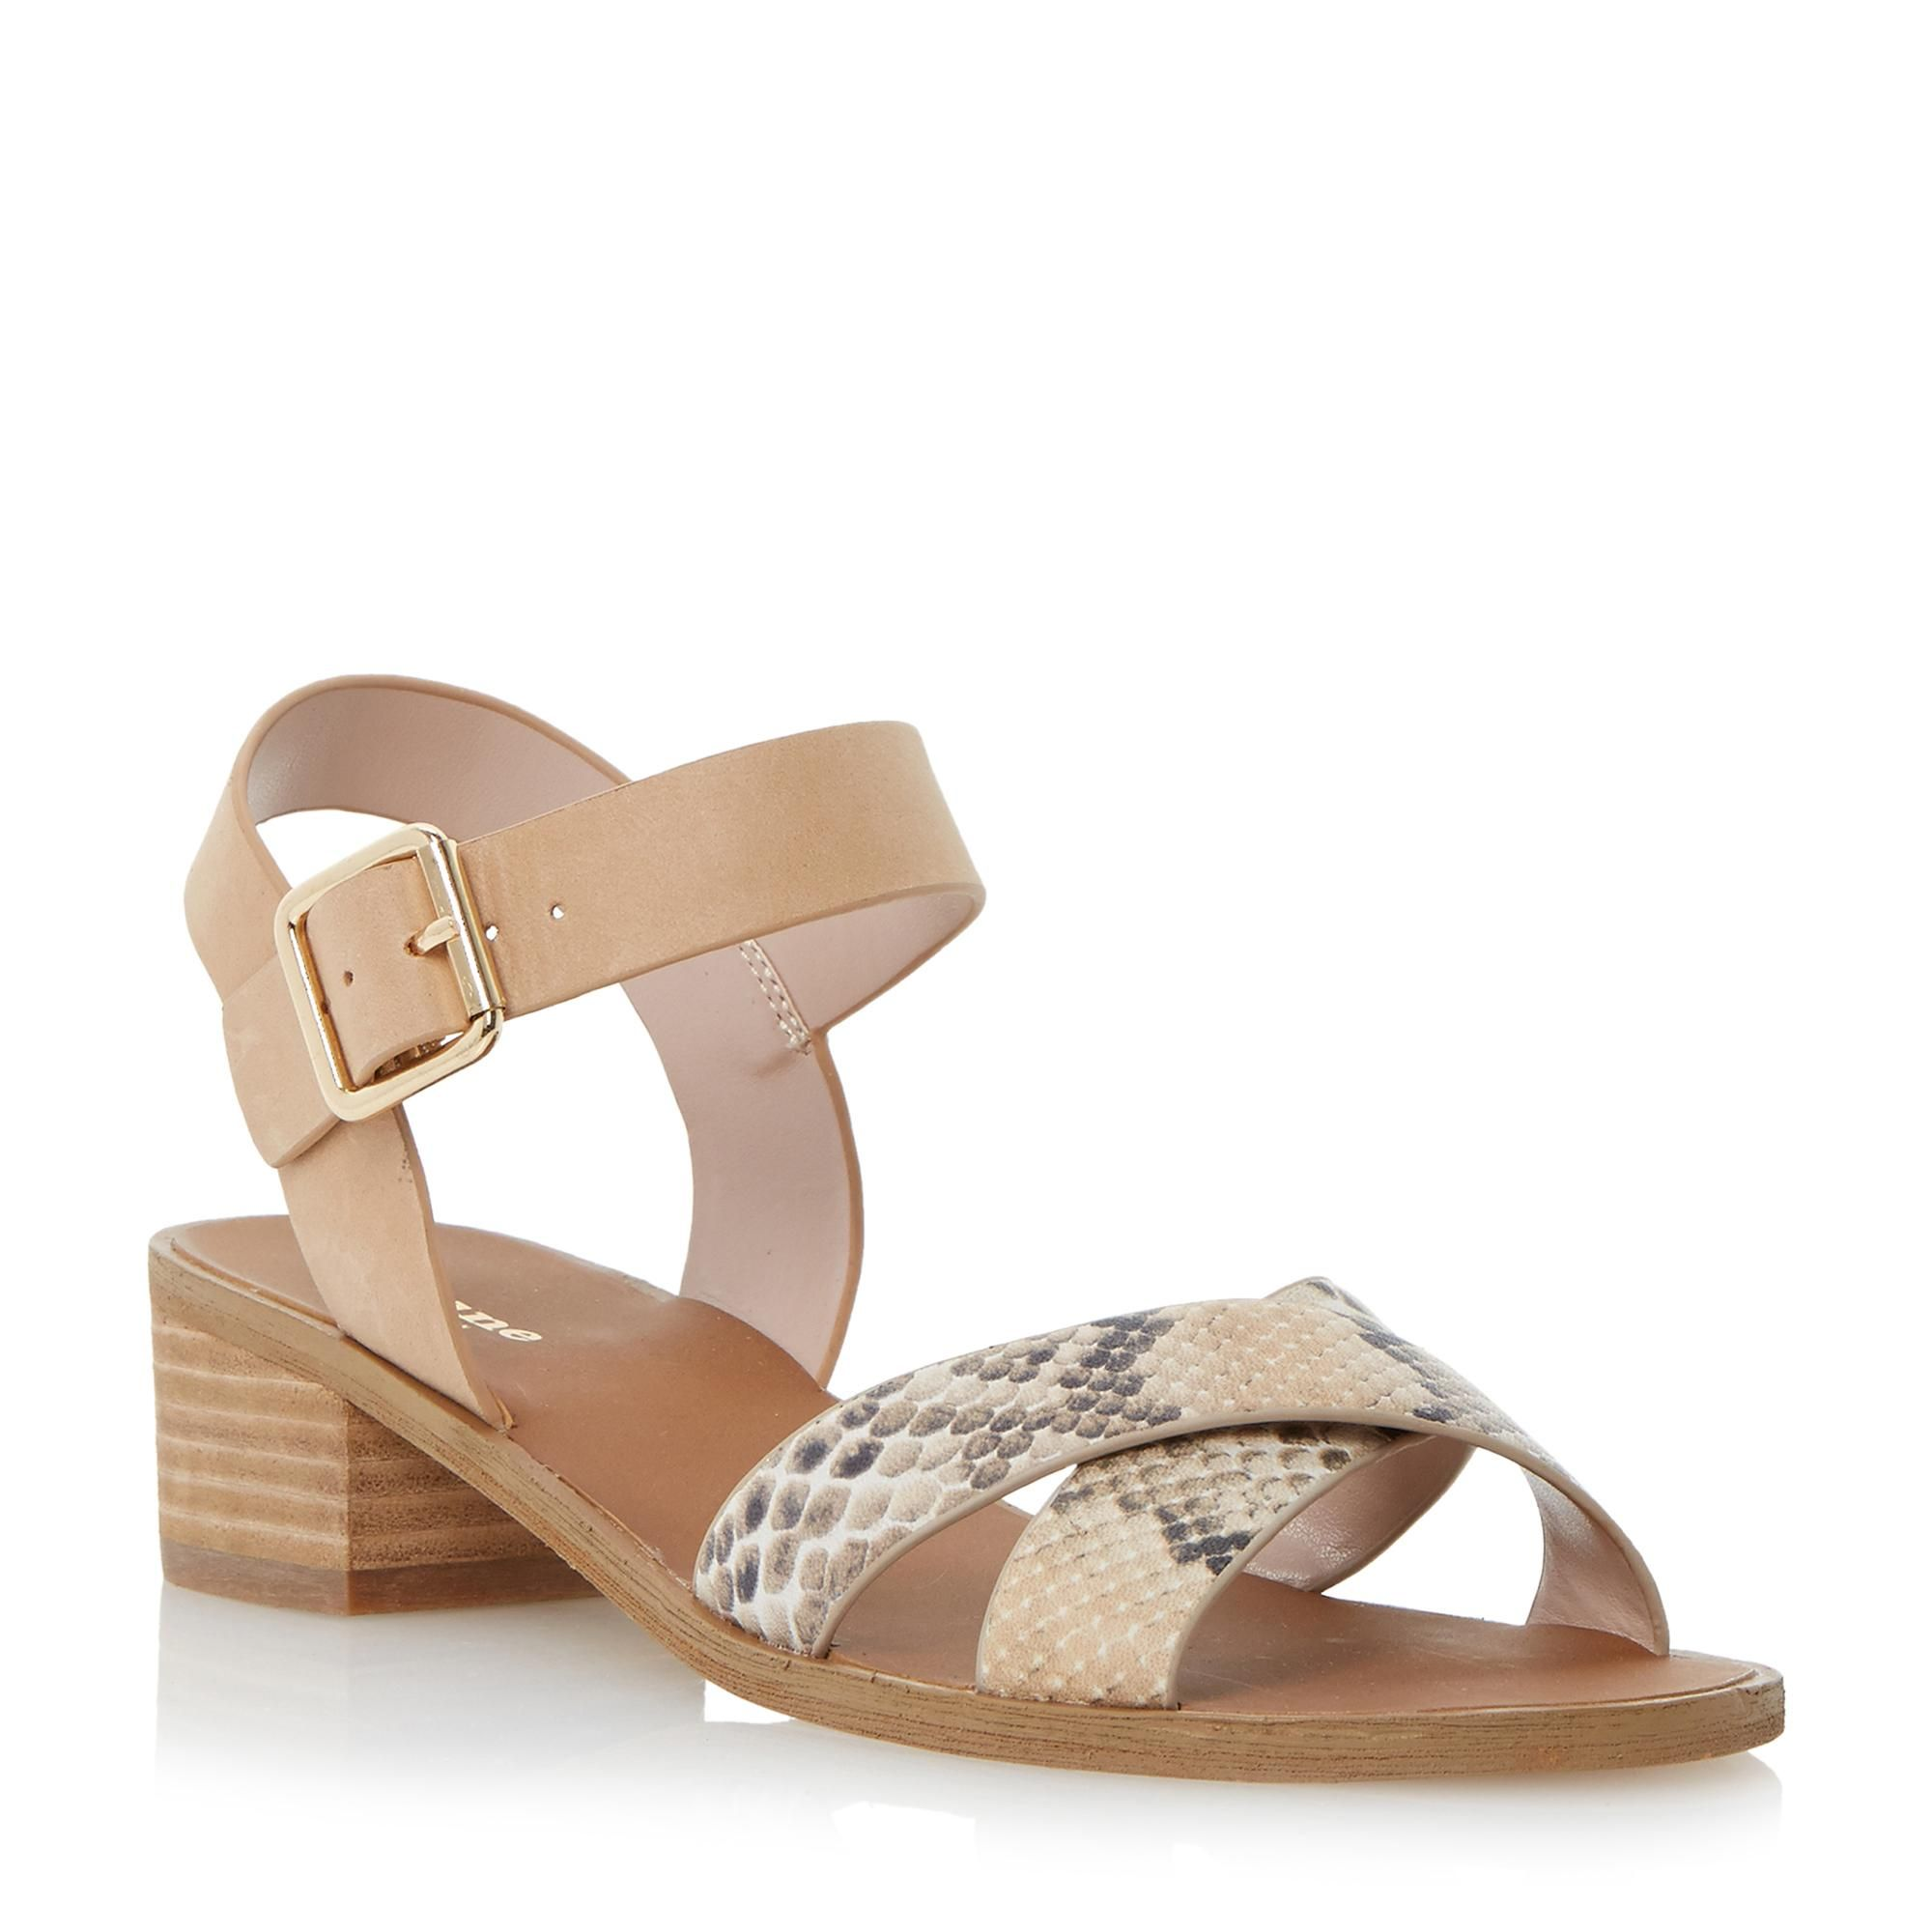 b78e0d8a551 DUNE LADIES JOTTA - Contrast Crossover Strap Low Block Heel Sandal - tan